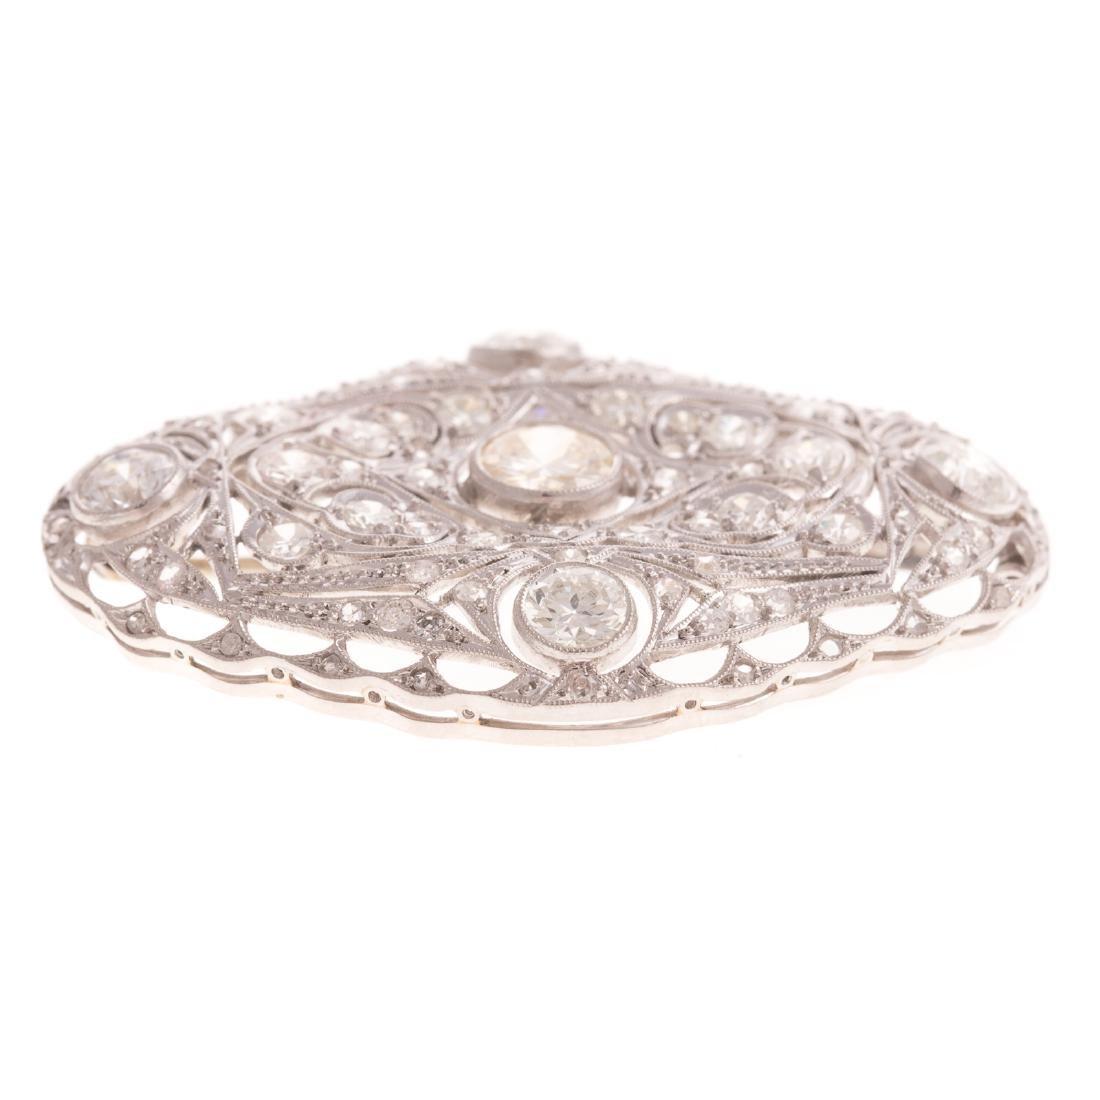 An Art Deco Diamond Filigree Brooch in Platinum - 2